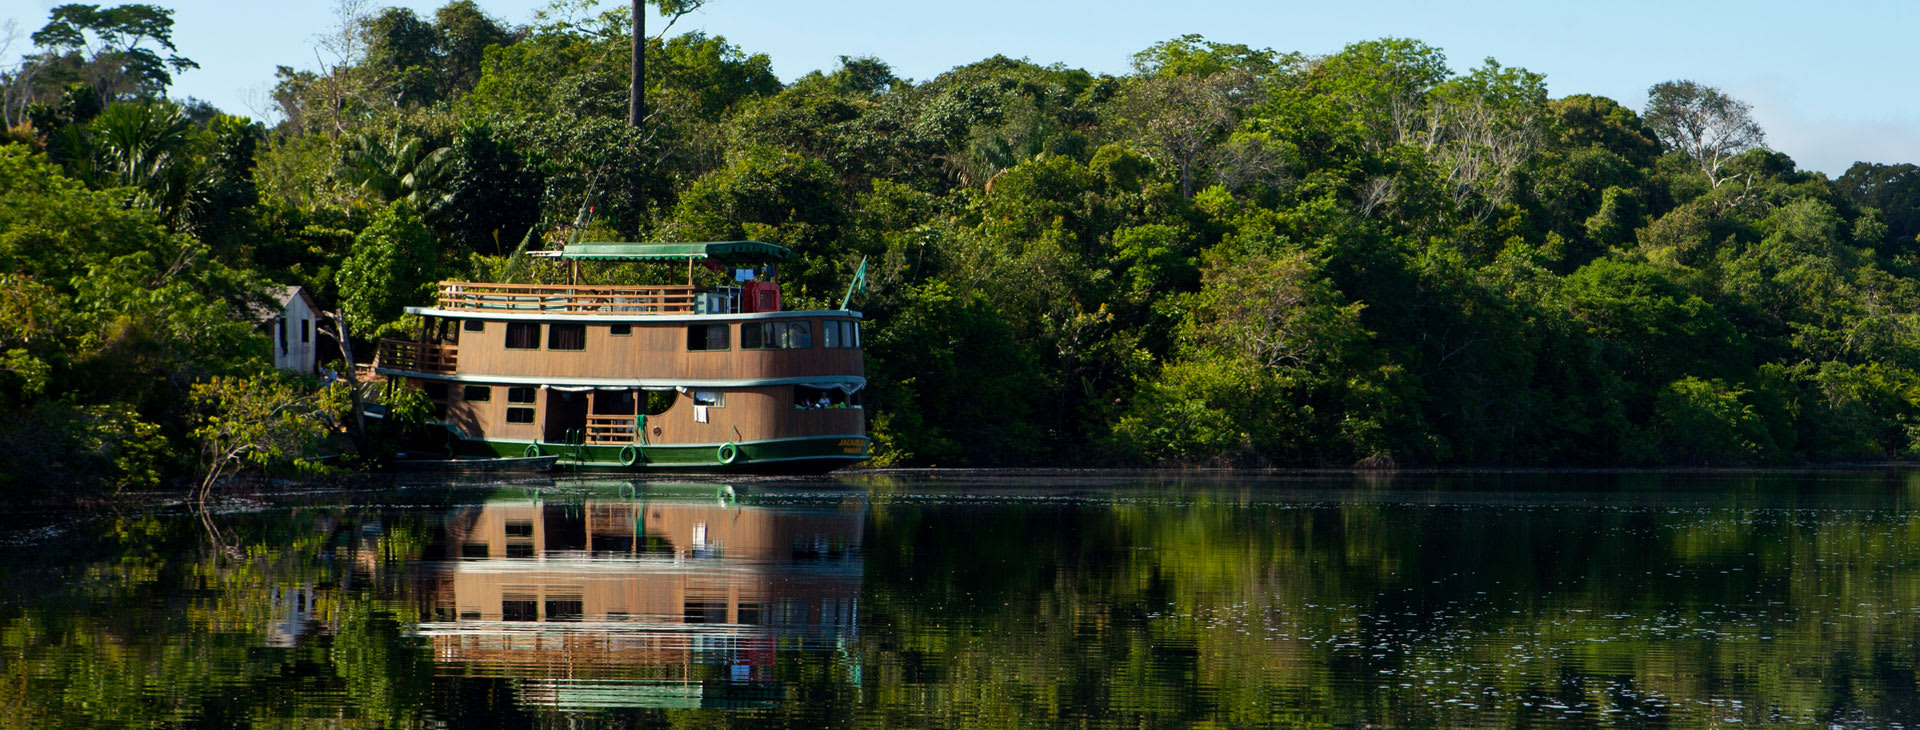 Ship on the calm river